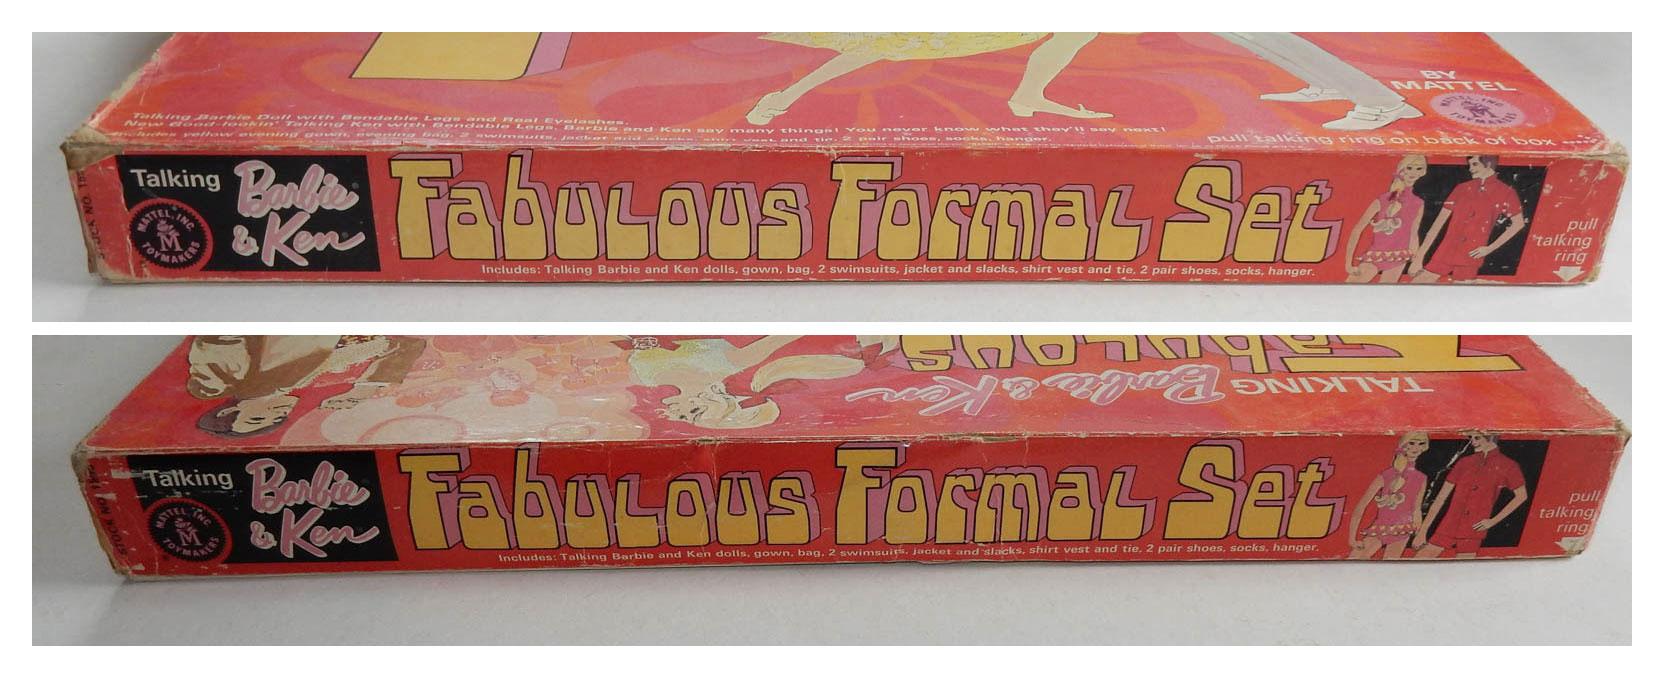 1969 #1595 Sears Fabulous Formal Set packaging detail